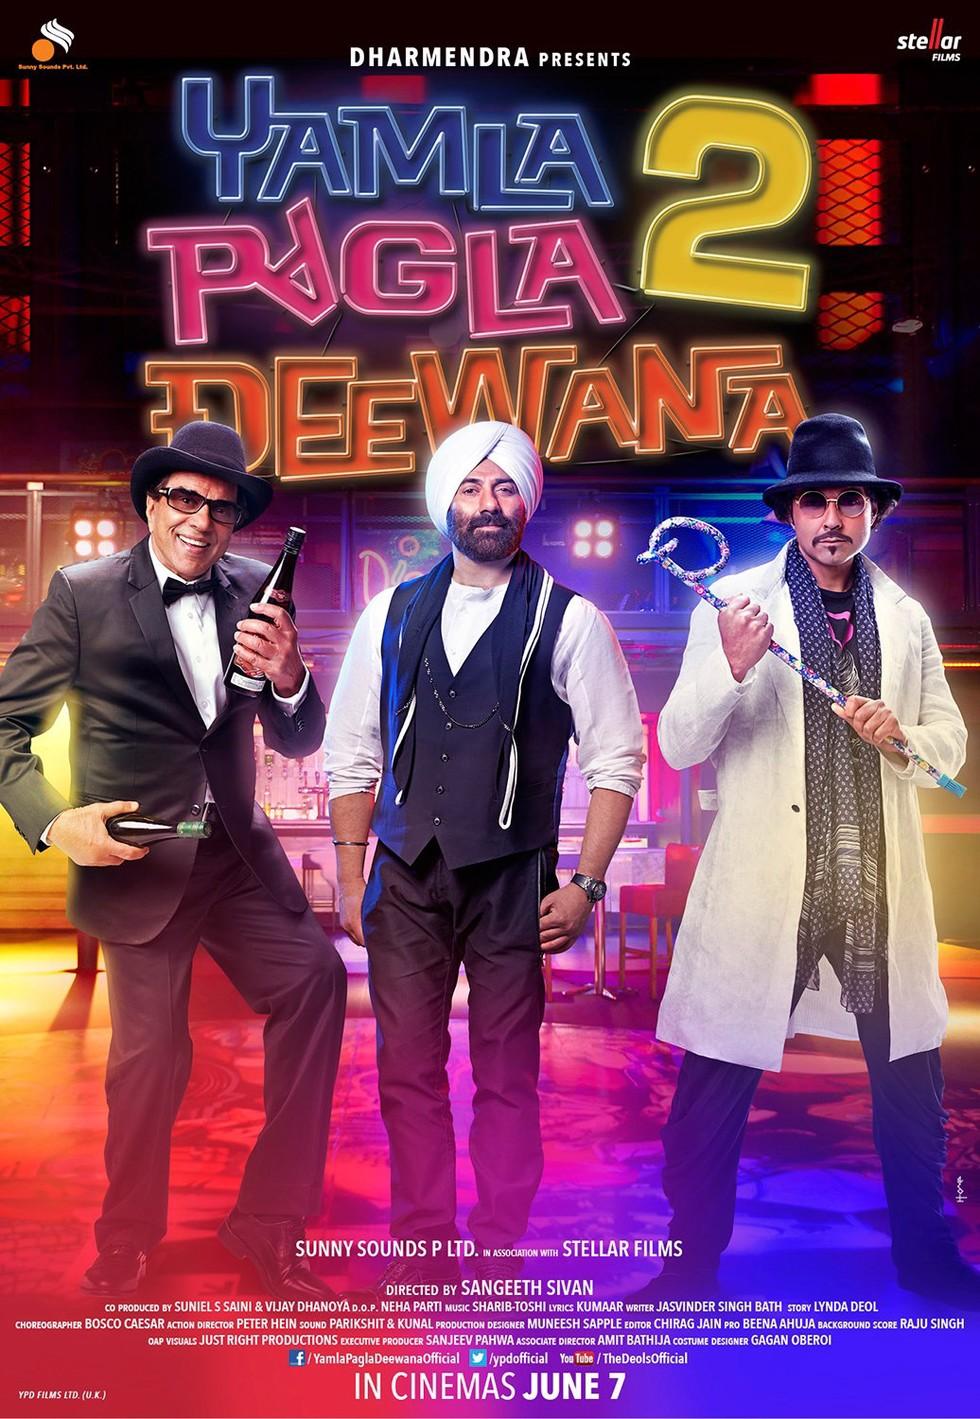 Yamla Pagla Deewana 2 - Movie Poster #8 (Large)